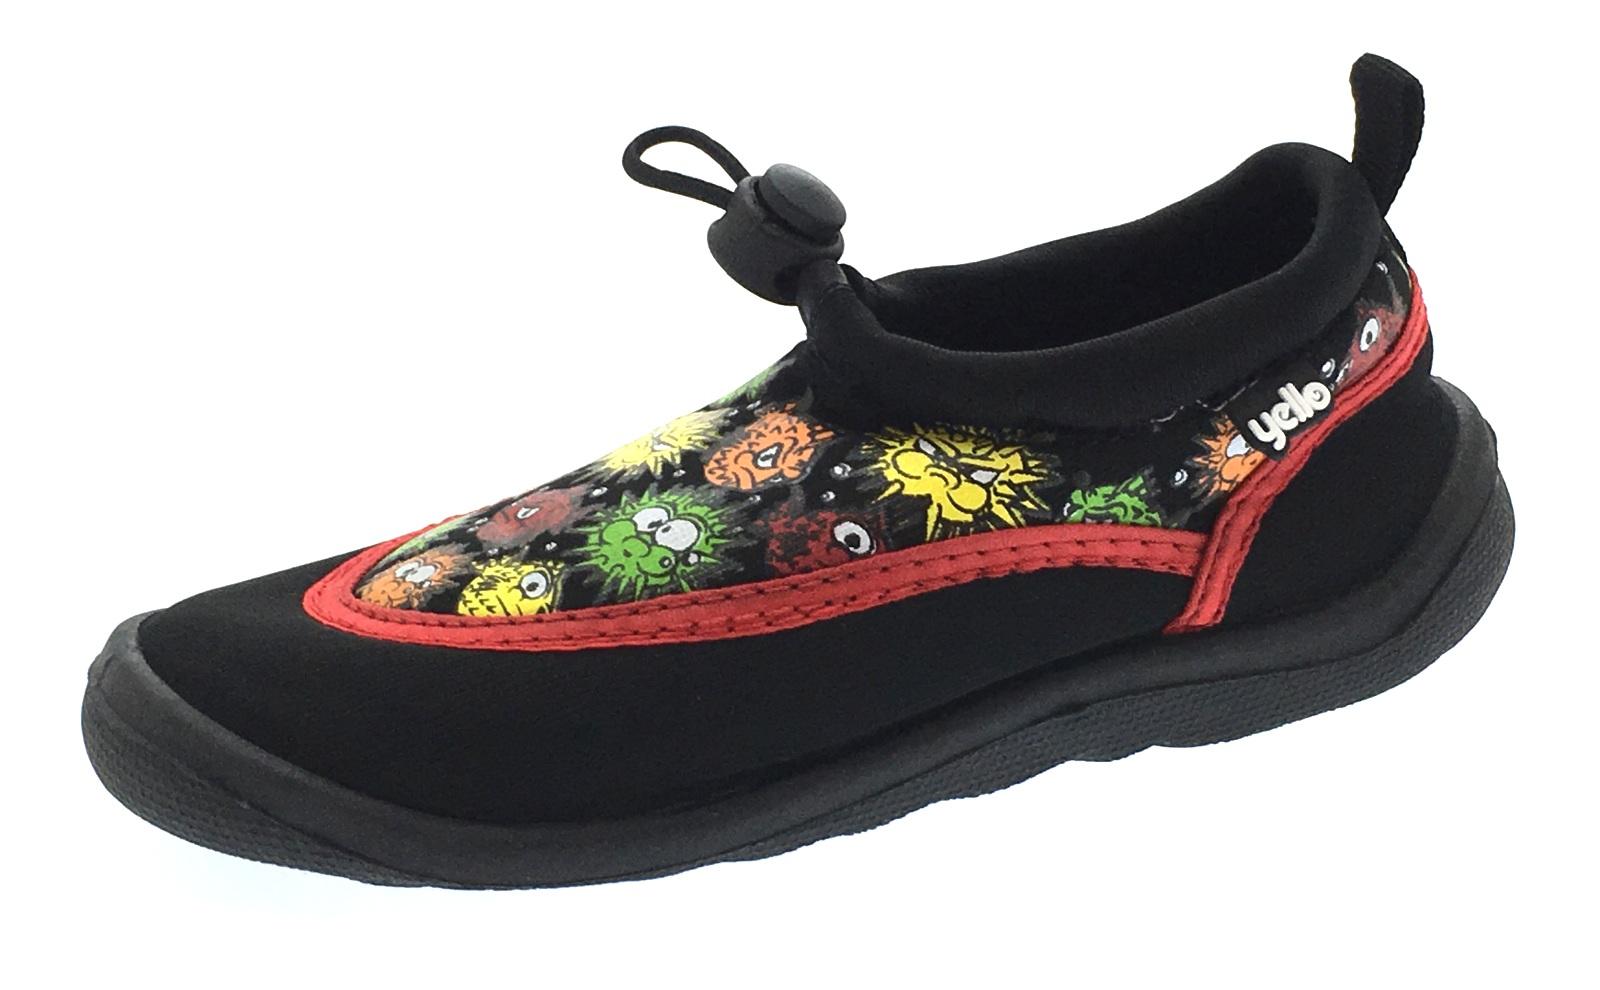 Black sandals ebay uk - Kids Boys Girls Urban Beach Aqua Socks Sandals